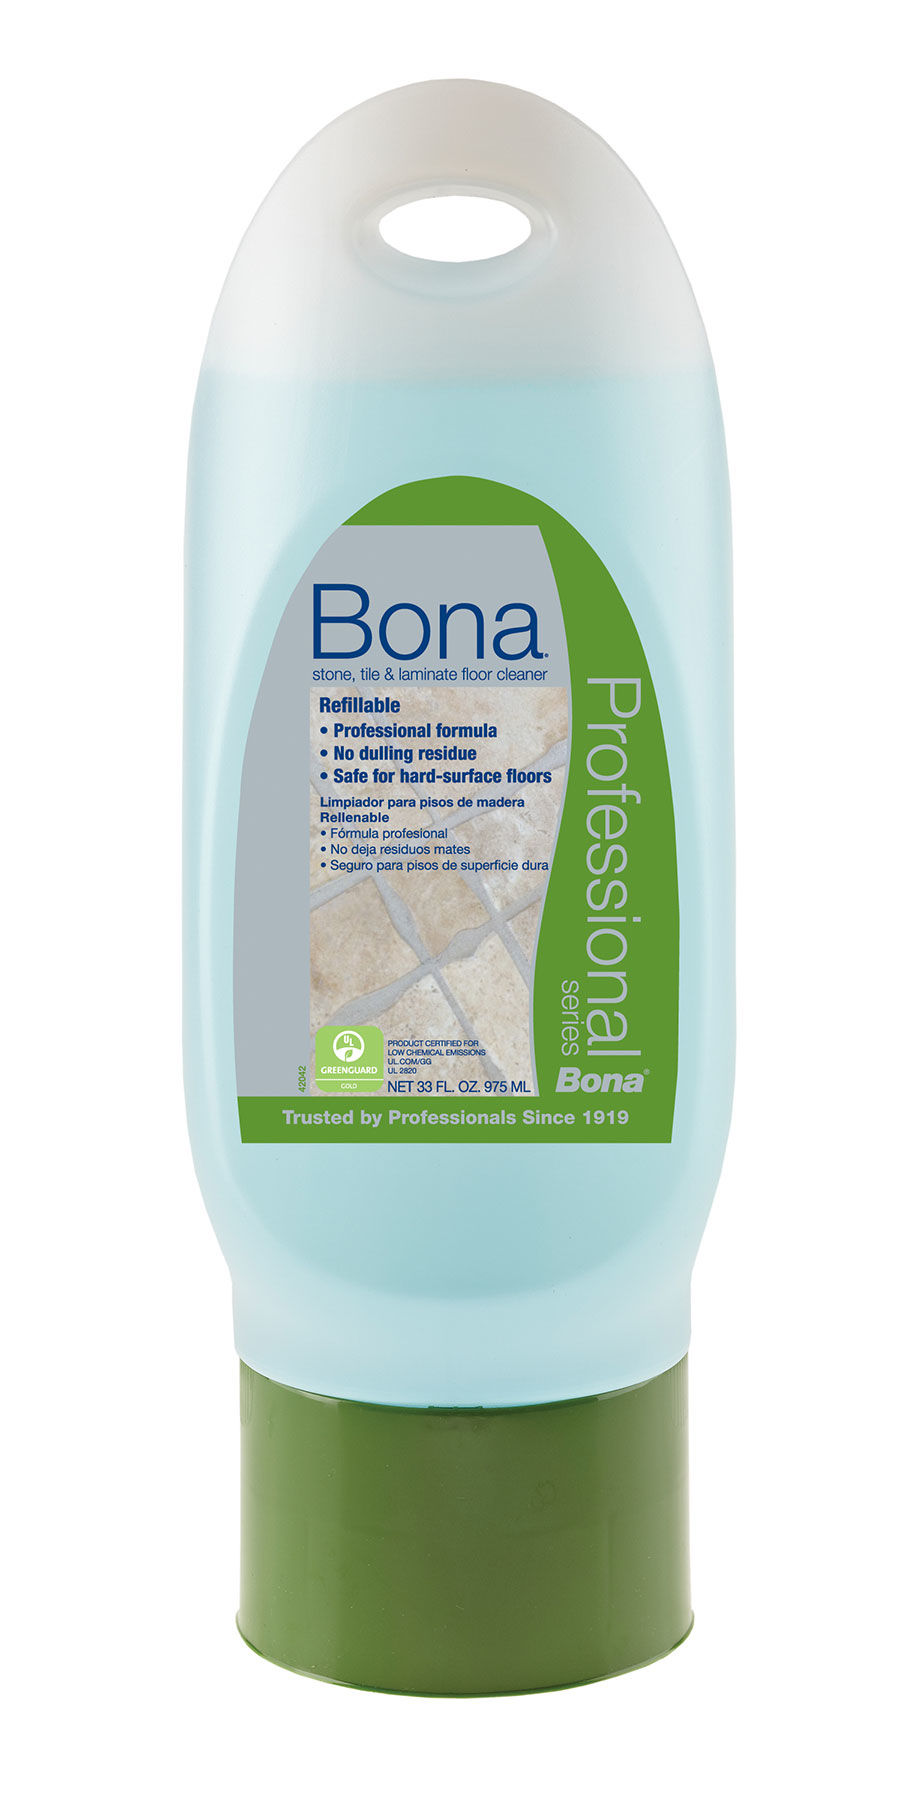 Bona pro series spray mop cleaner cartridge tile 33oz - Bona spray mop ...